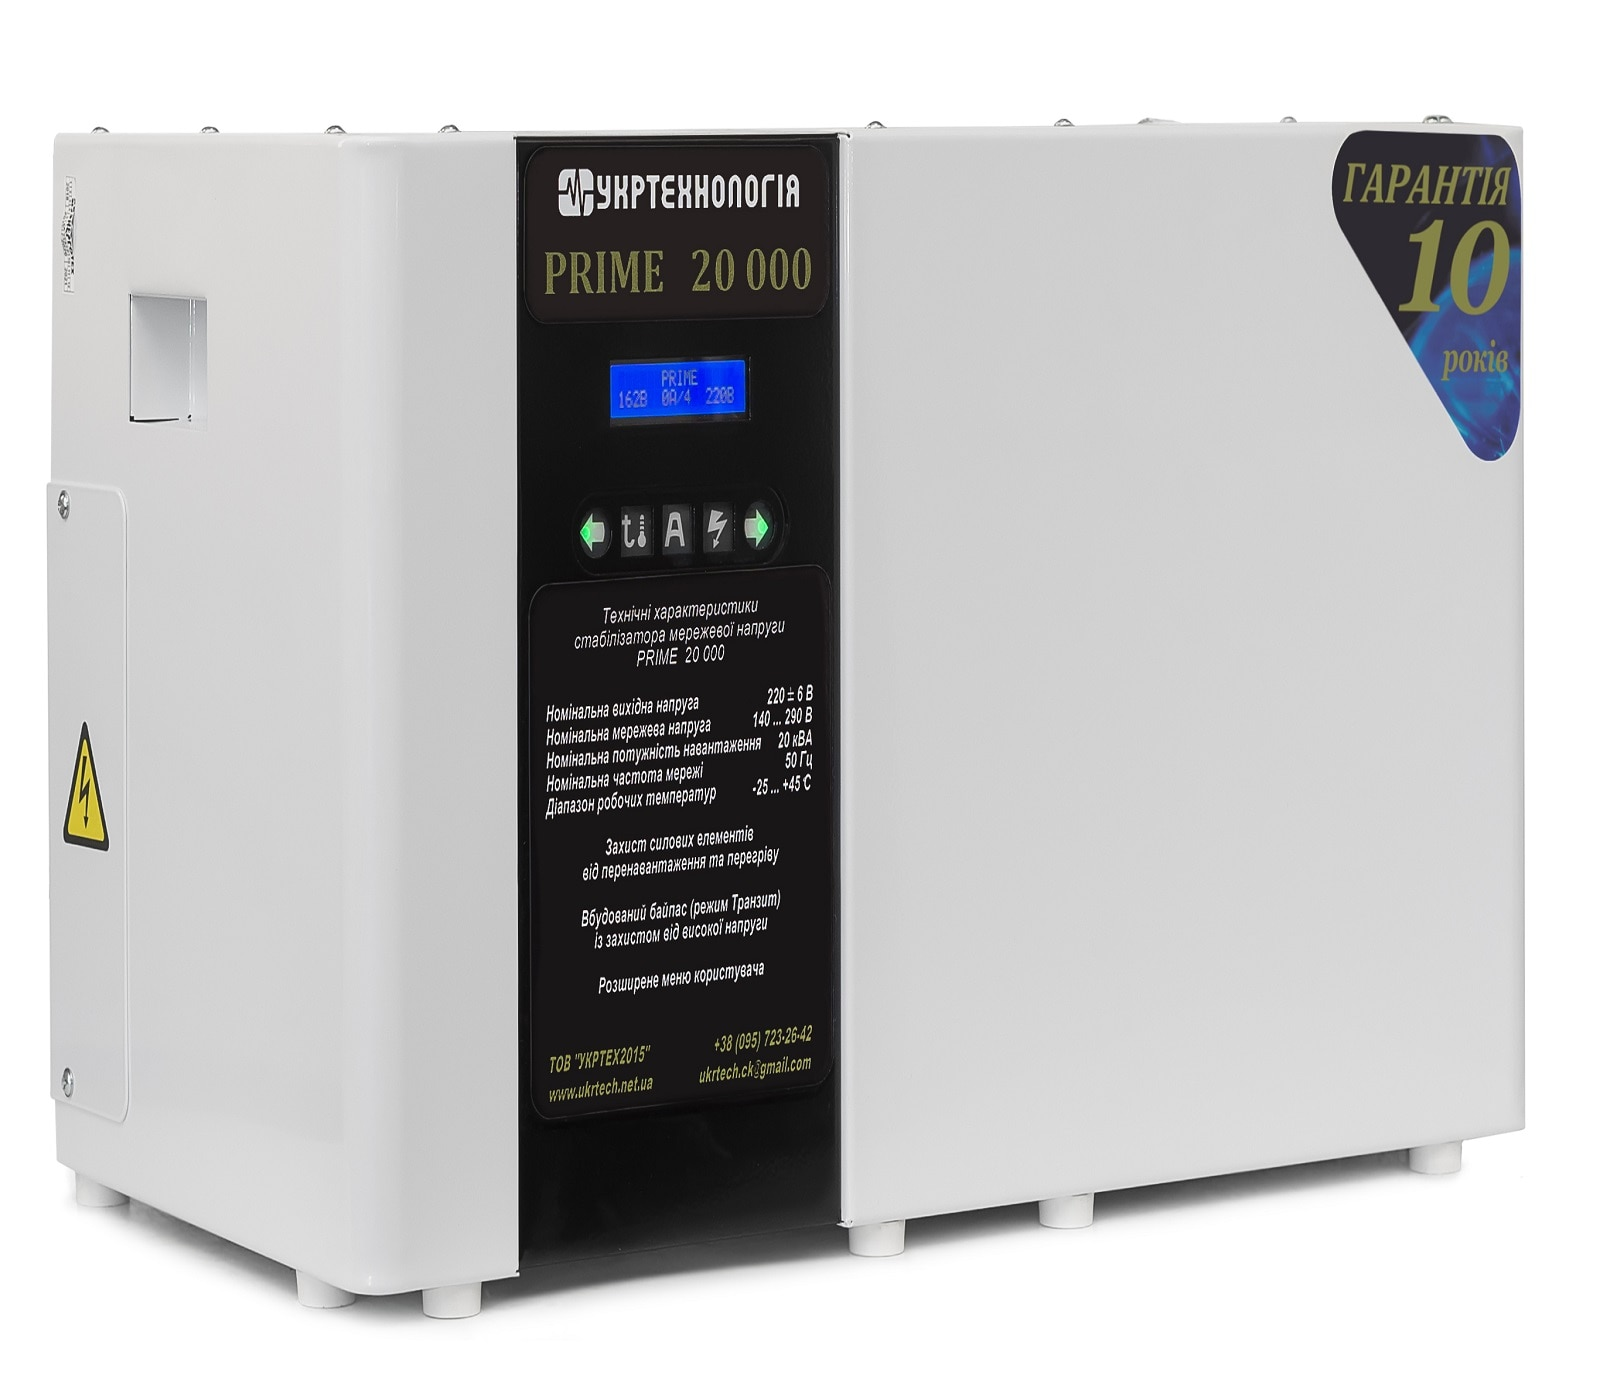 Стабилизаторы напряжения - Стабилизатор напряжения 20 кВт РRIME 000001461 - Фото 2